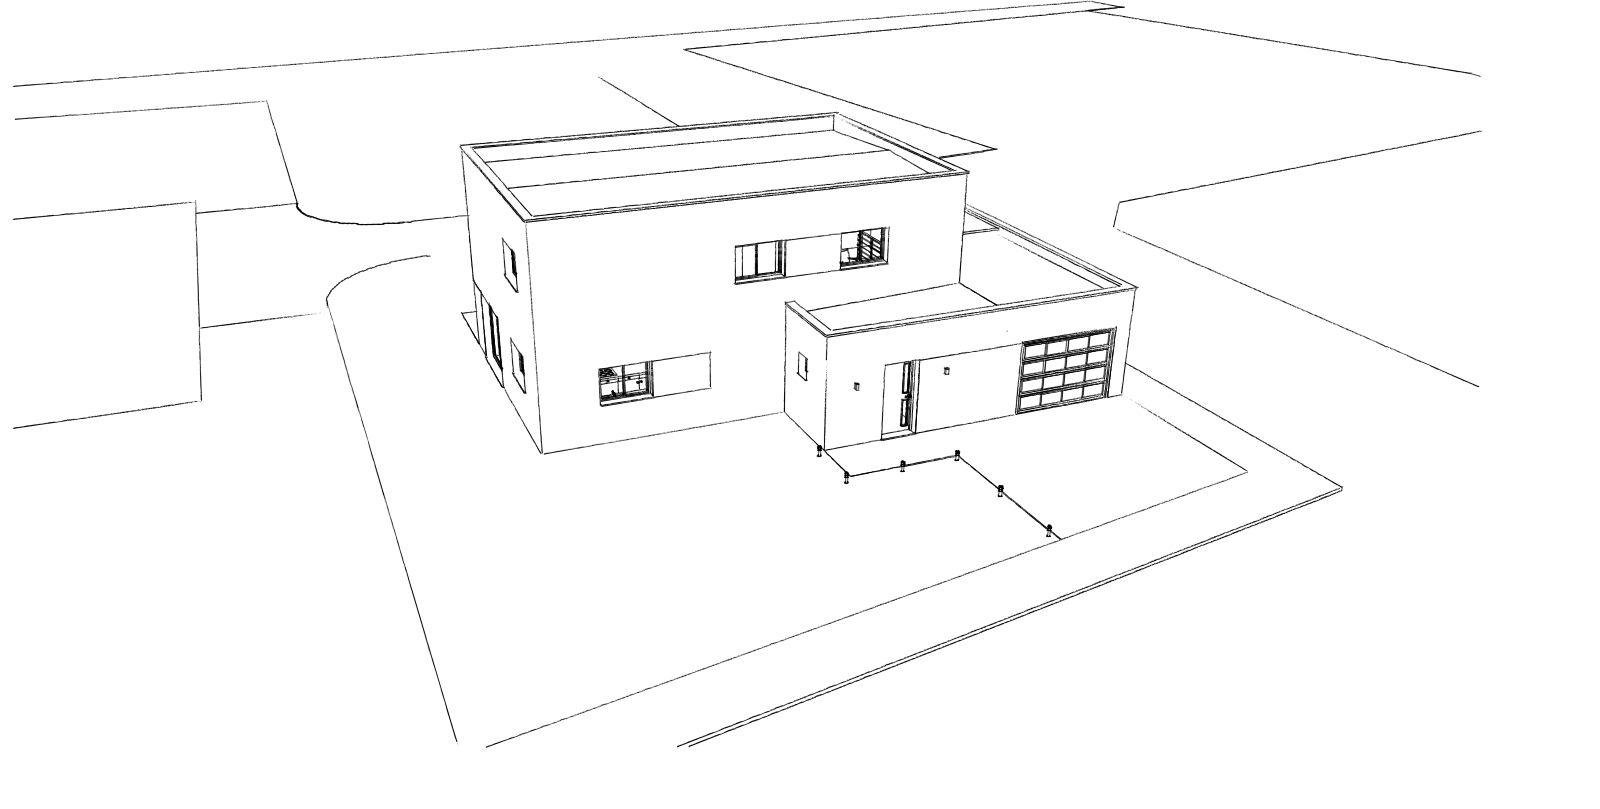 permis de construire architecte Lille 1